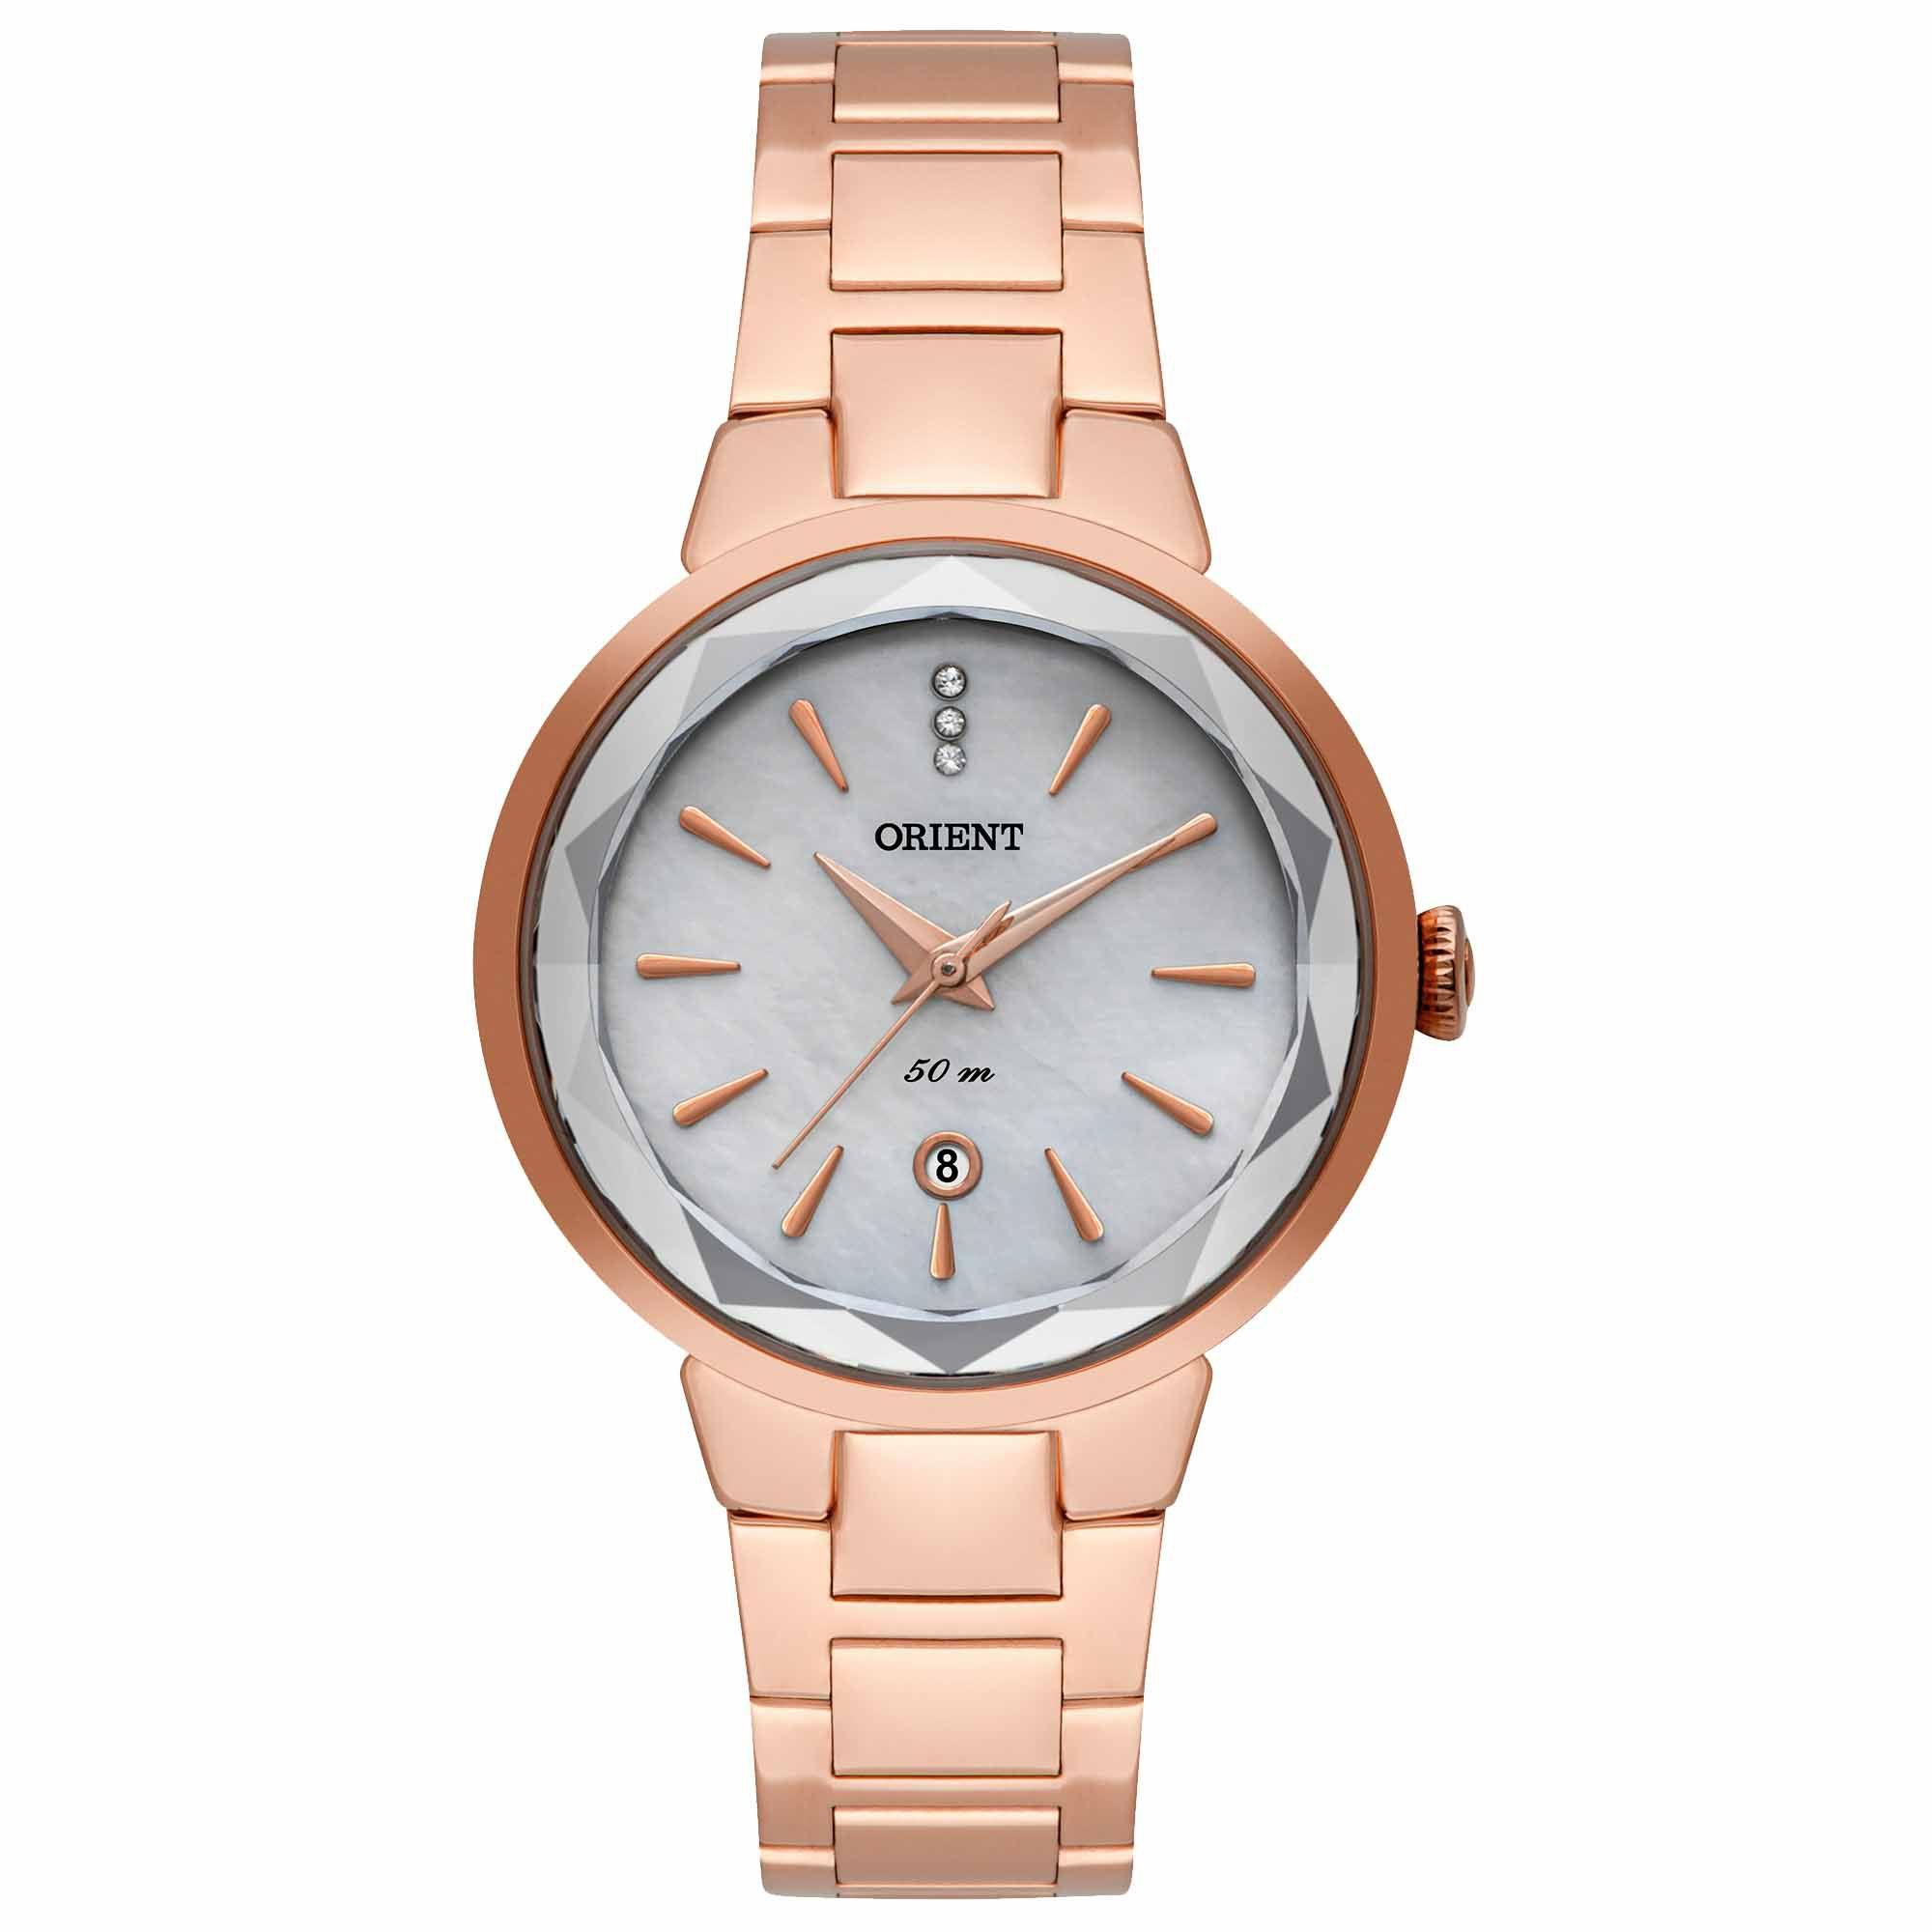 Relógio Feminino Orient FRSS1055 B1RX